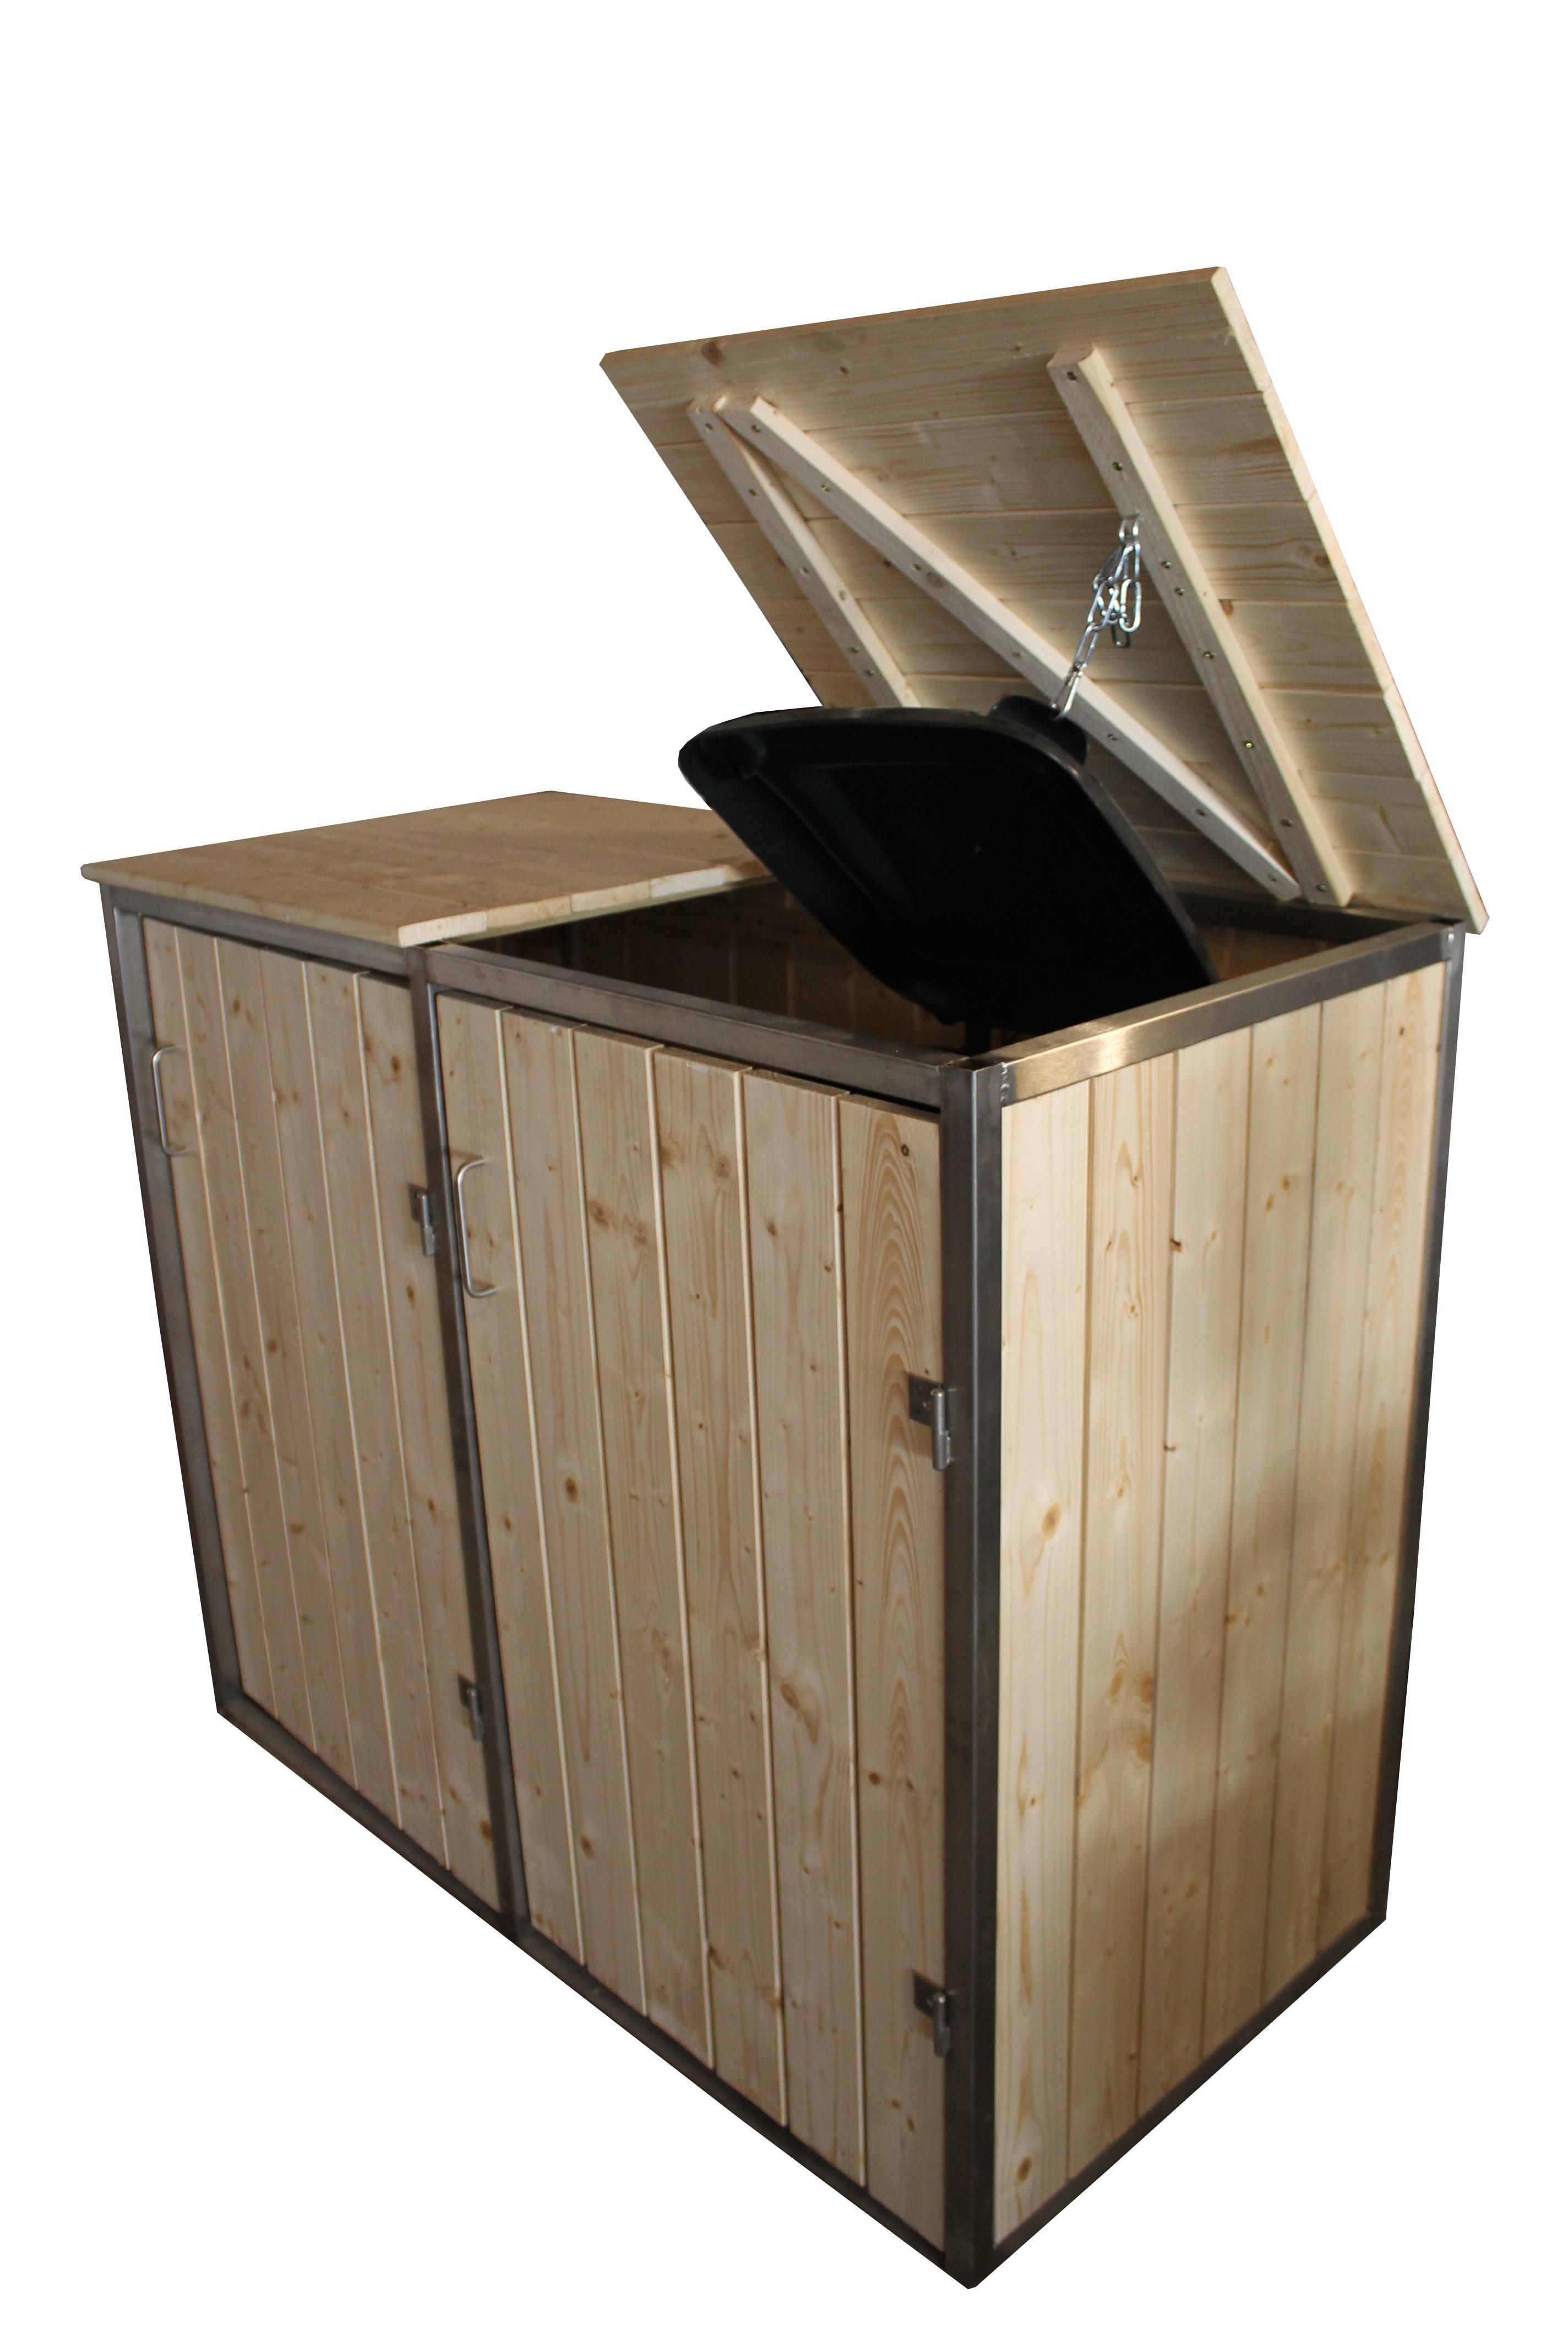 m lltonnenbox m lltonnenhaus aus edelstahl und holz 2x 120 liter stahl moor. Black Bedroom Furniture Sets. Home Design Ideas